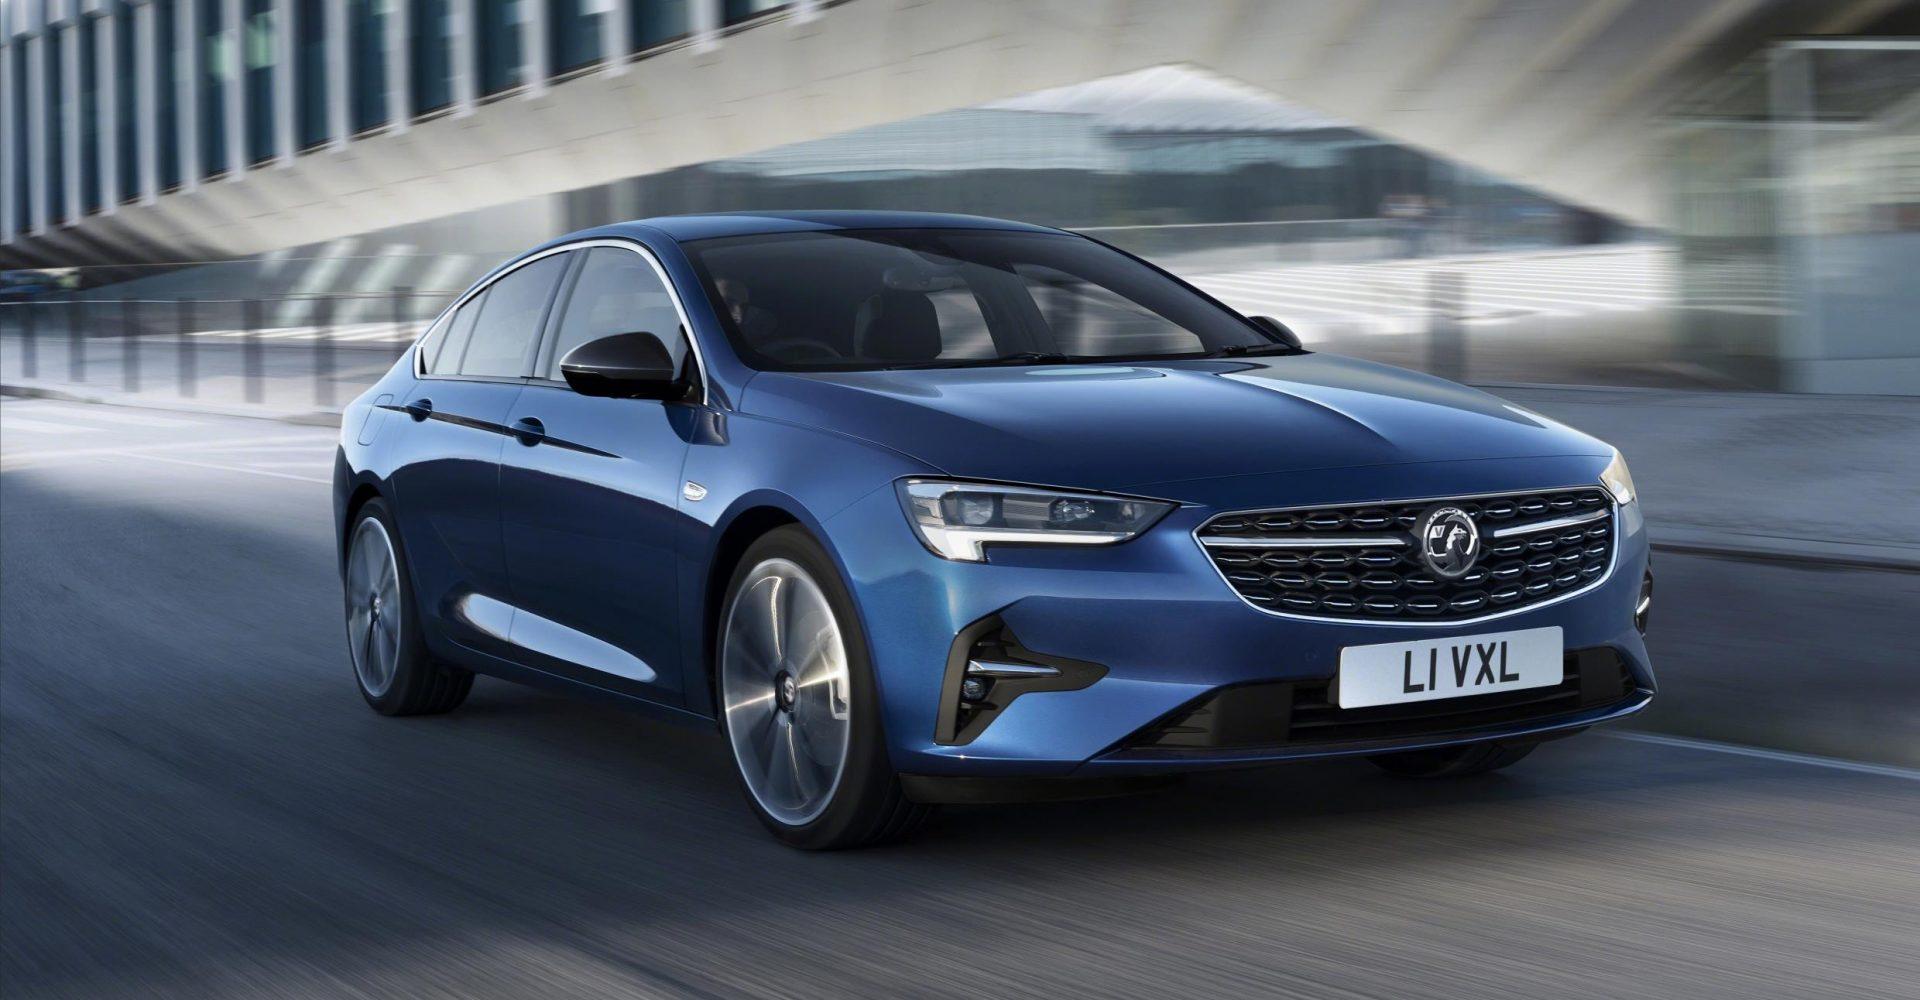 Vauxhall reveals full Insignia specs alongside GSi variant